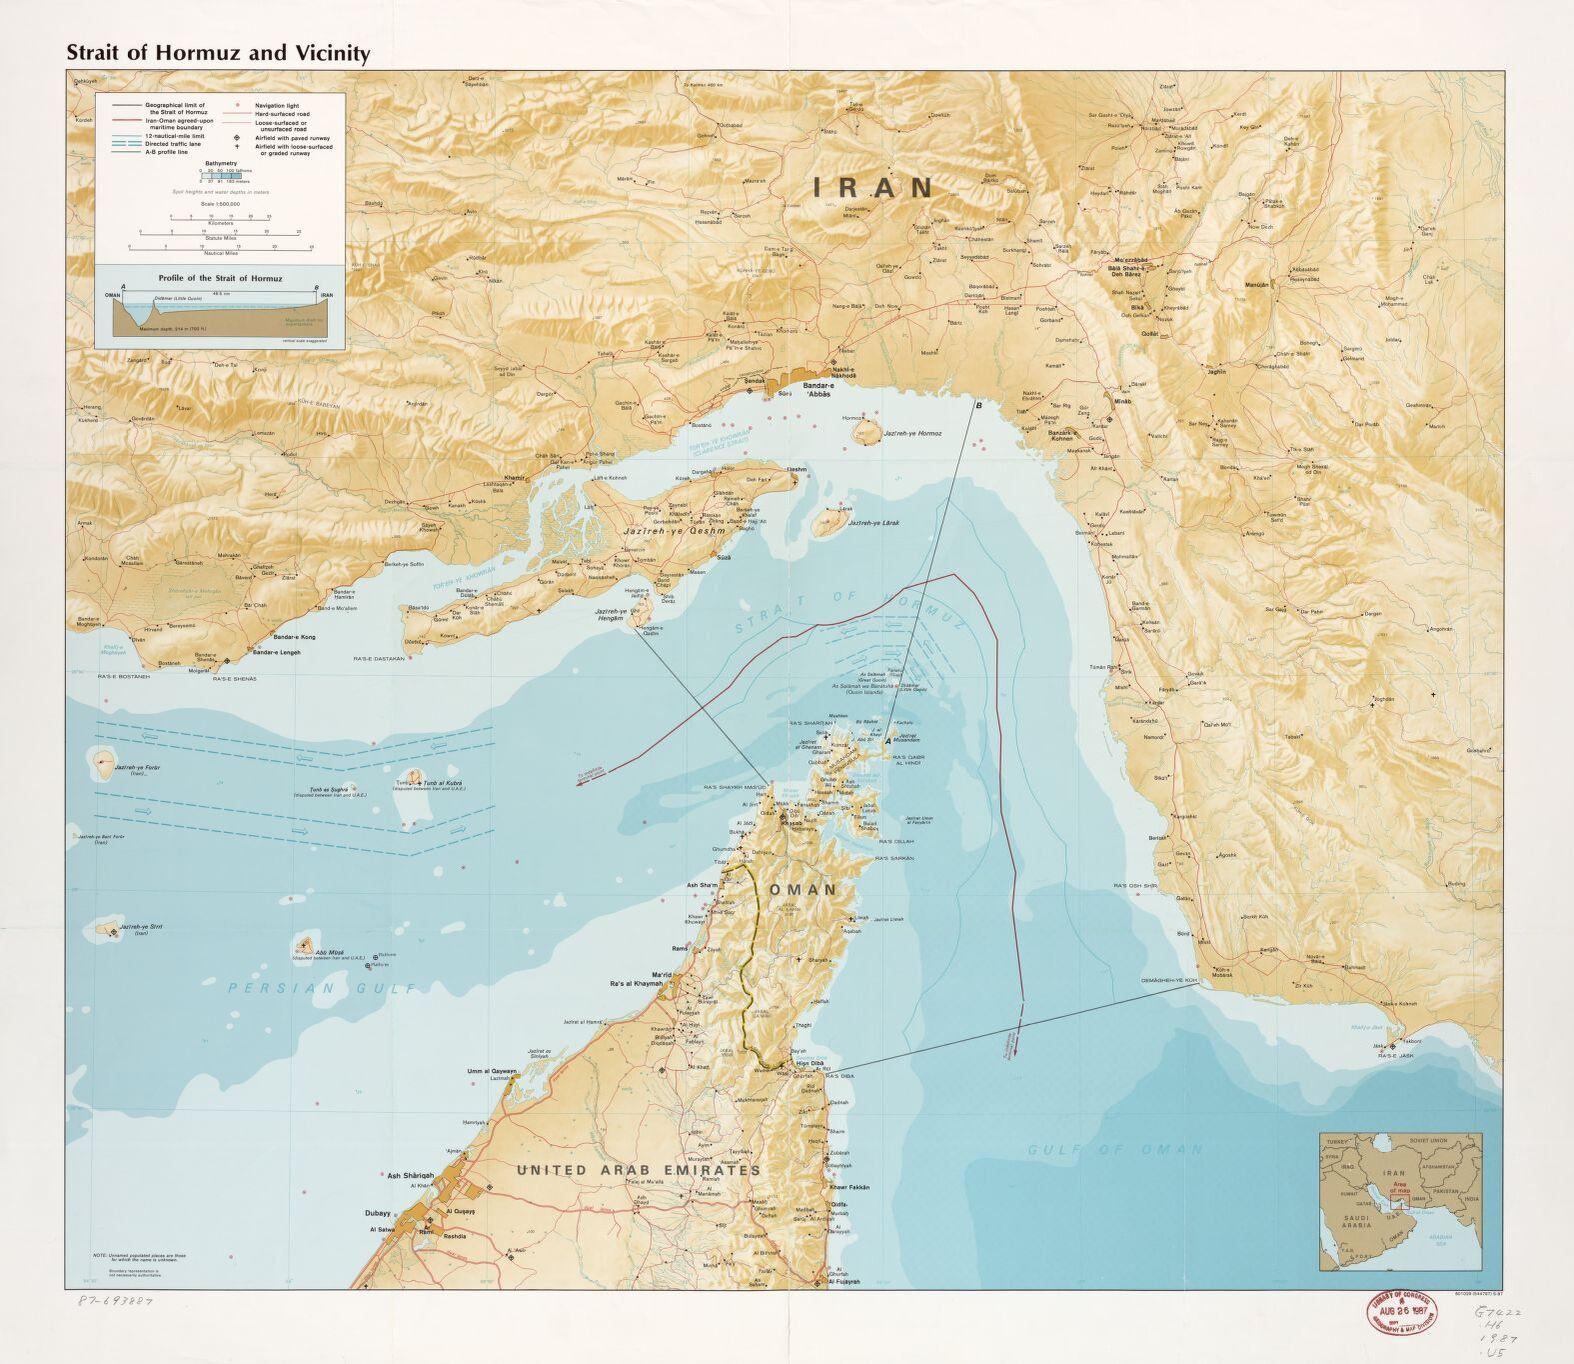 Strait-of-Hormuz-depth